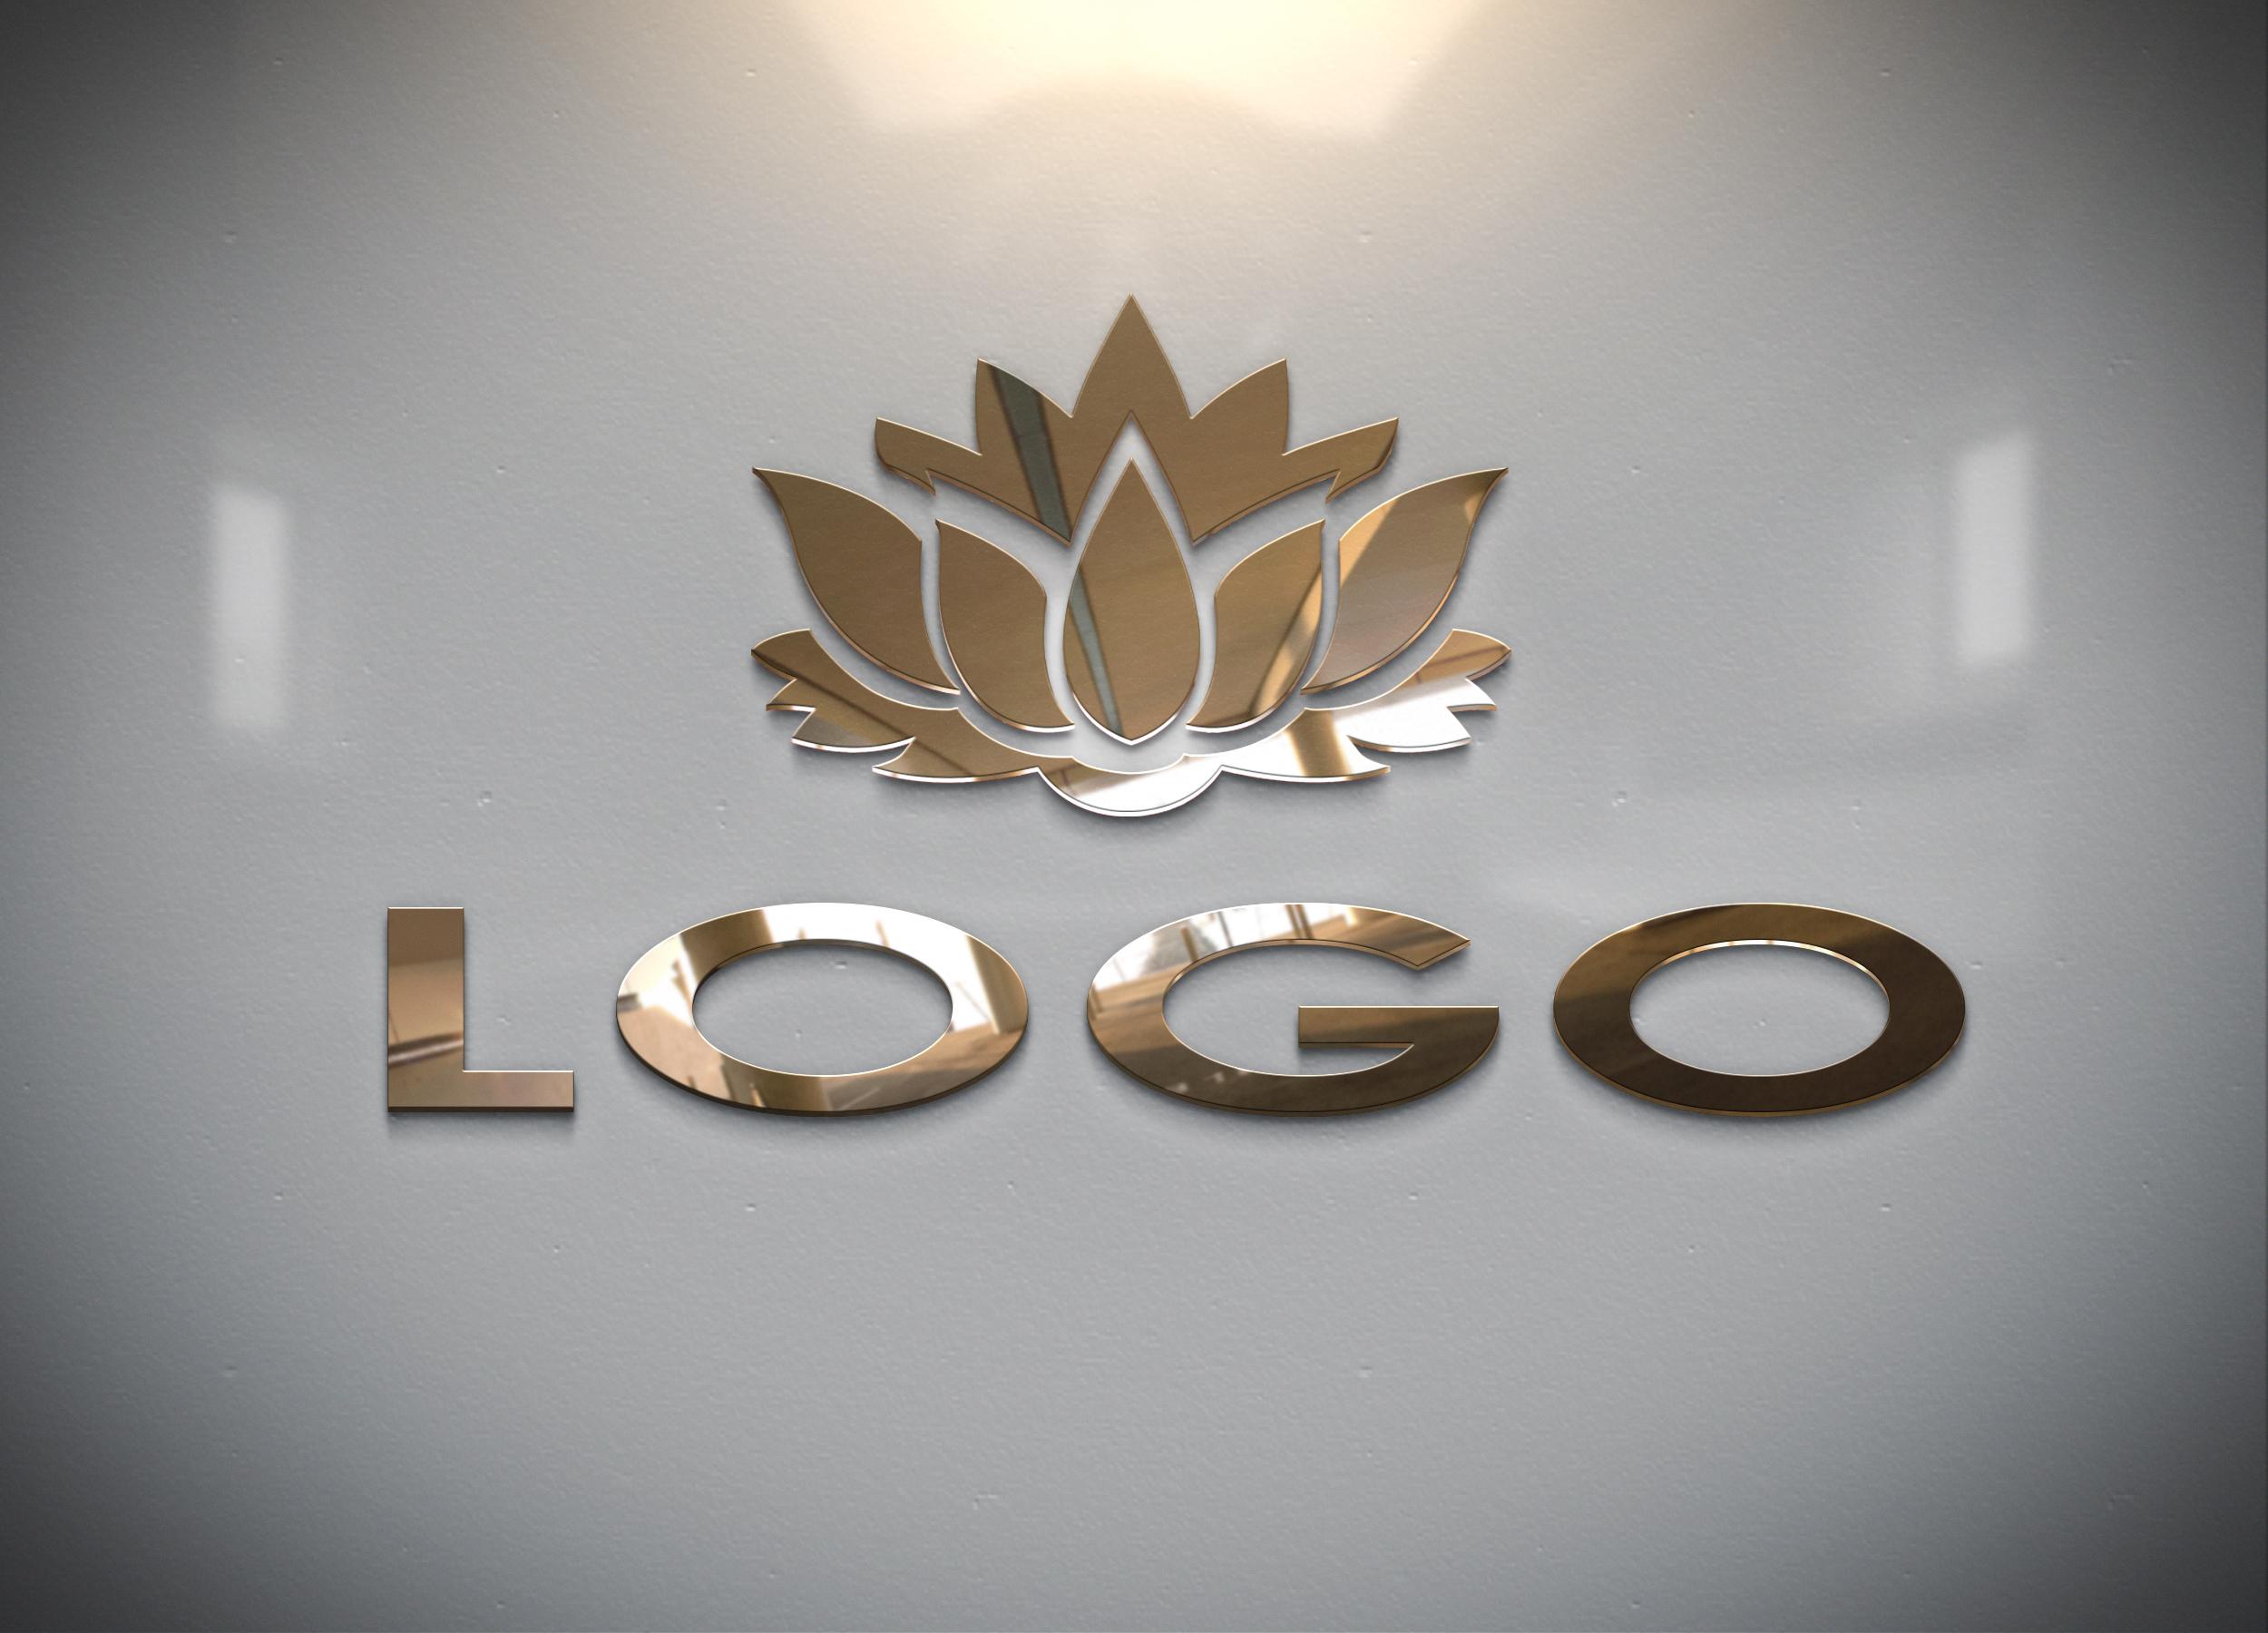 fast convert your logo into 3D MockUp design - sample no5